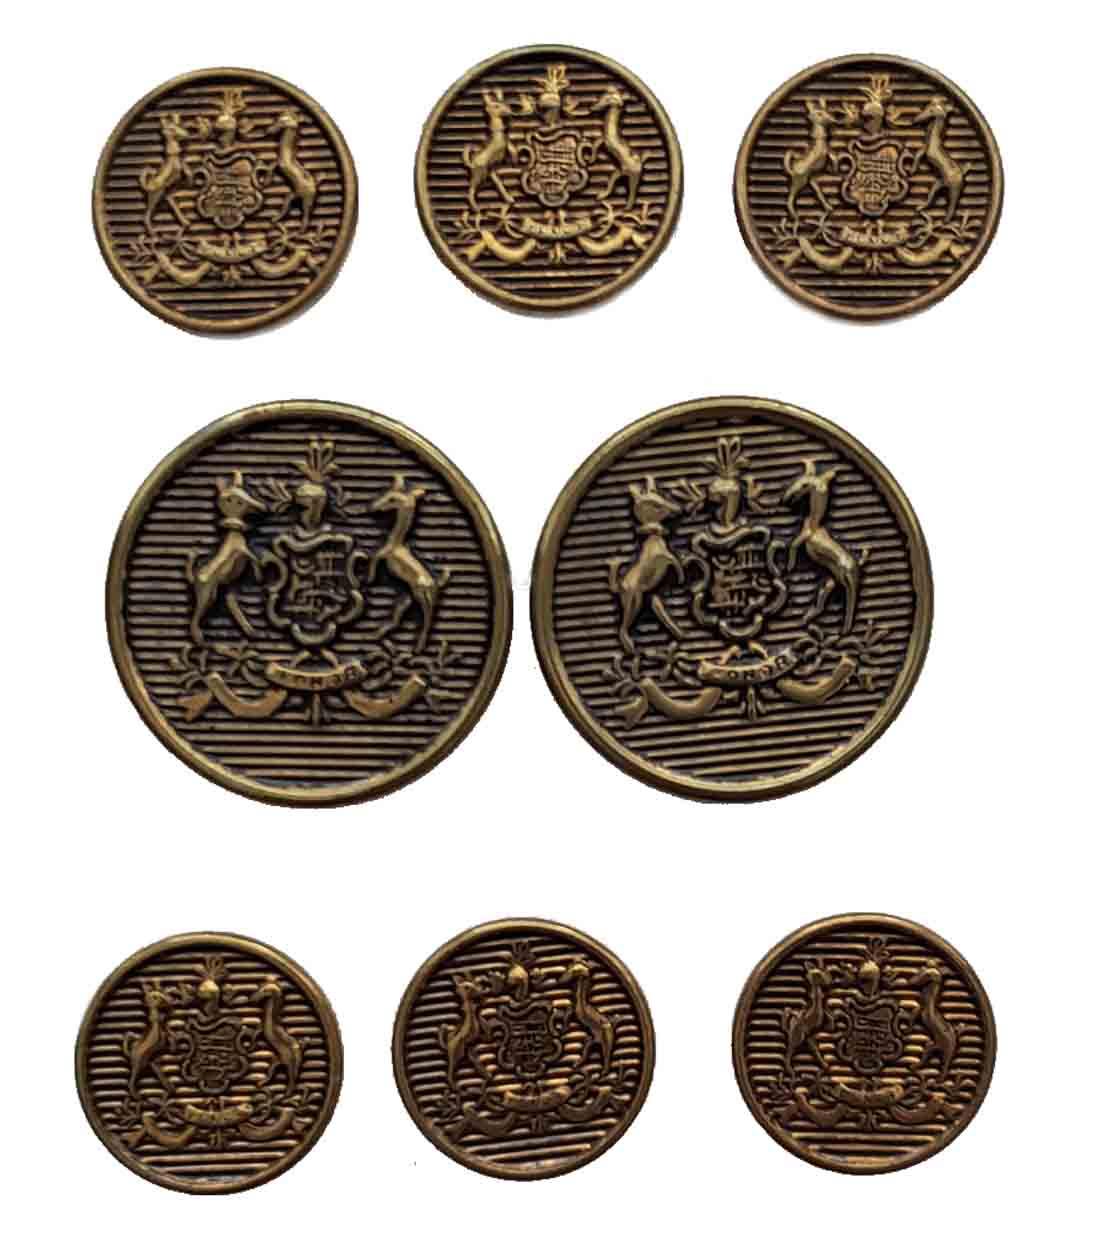 Vintage Southwick Blazer Buttons Set Antique Gold Brass Shank Dogs Honor Shield Men's